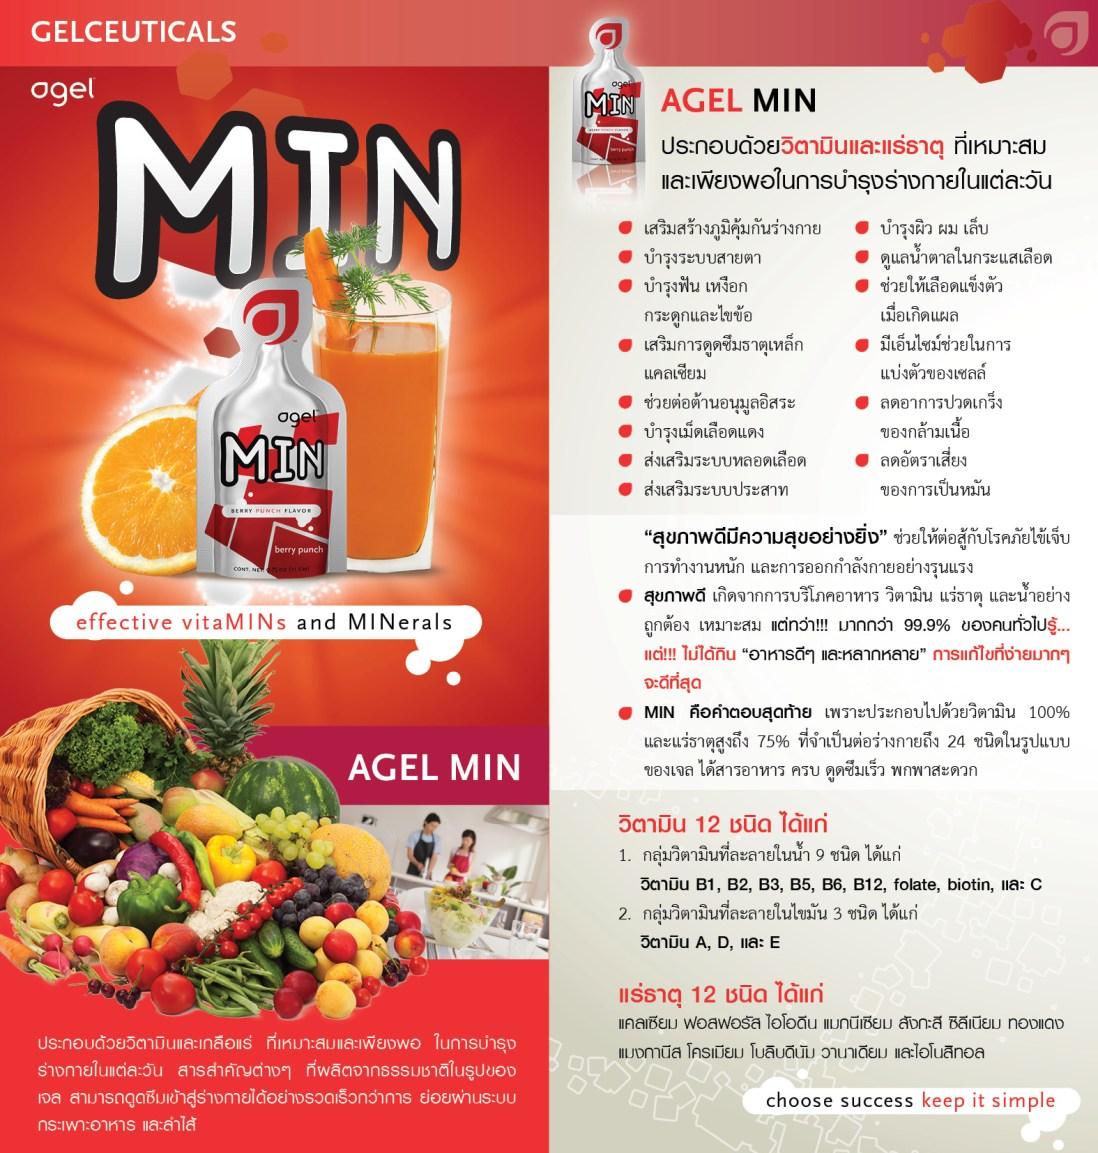 MIN วิตามิน แร่ธาตุ 24 ชนิด